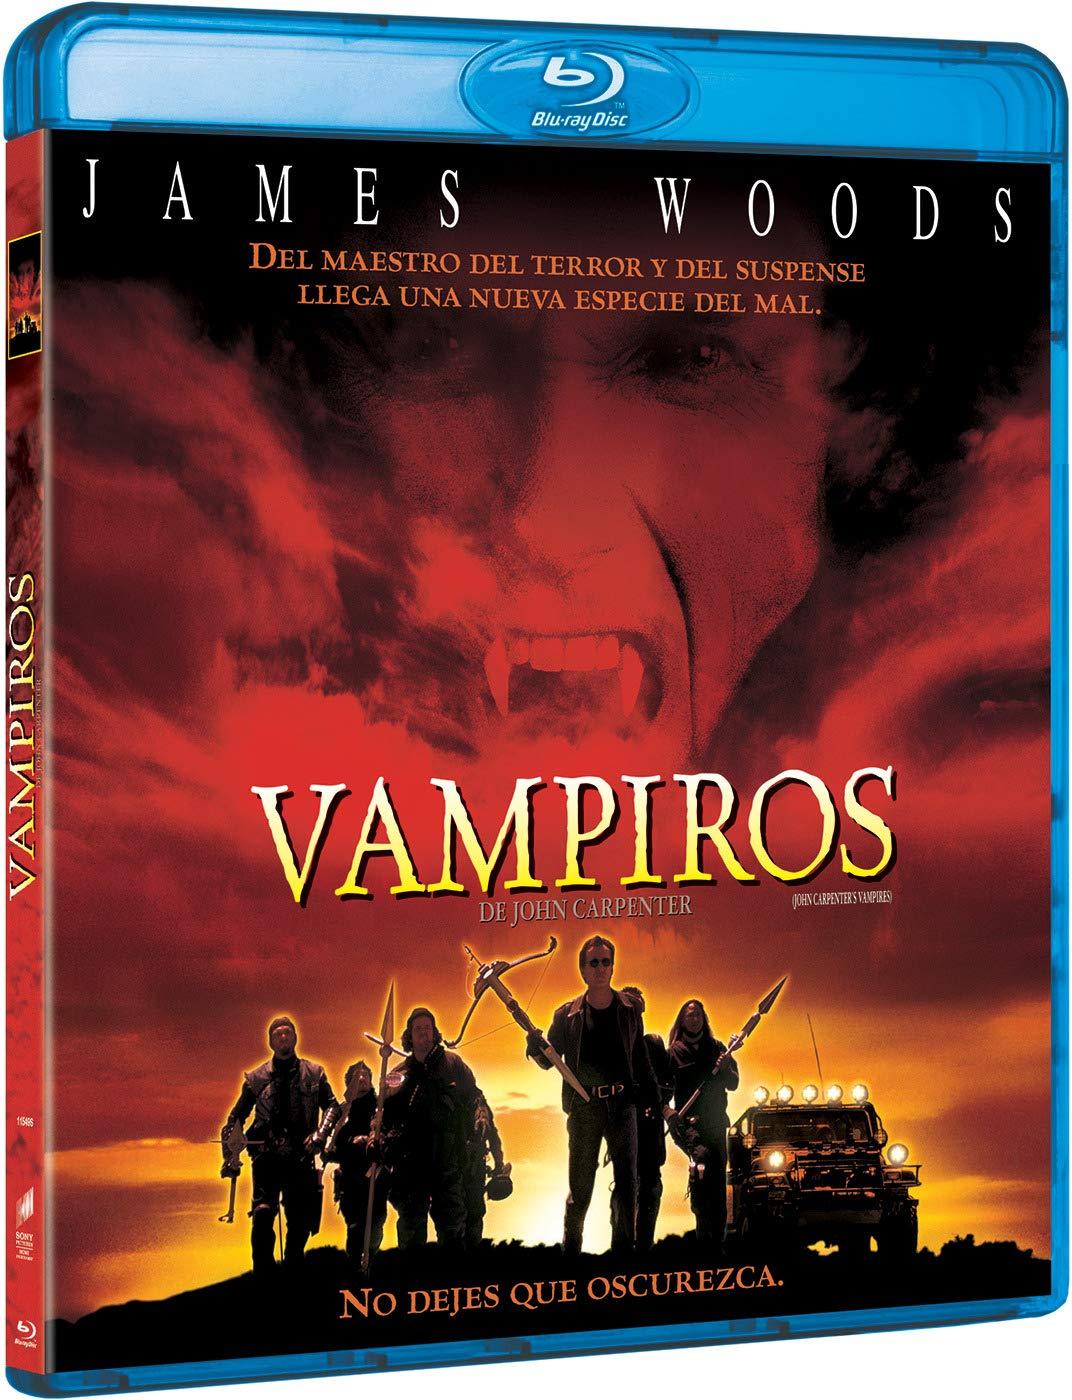 Disparatado Treintañero: 'Vampiros' de John Carpenter